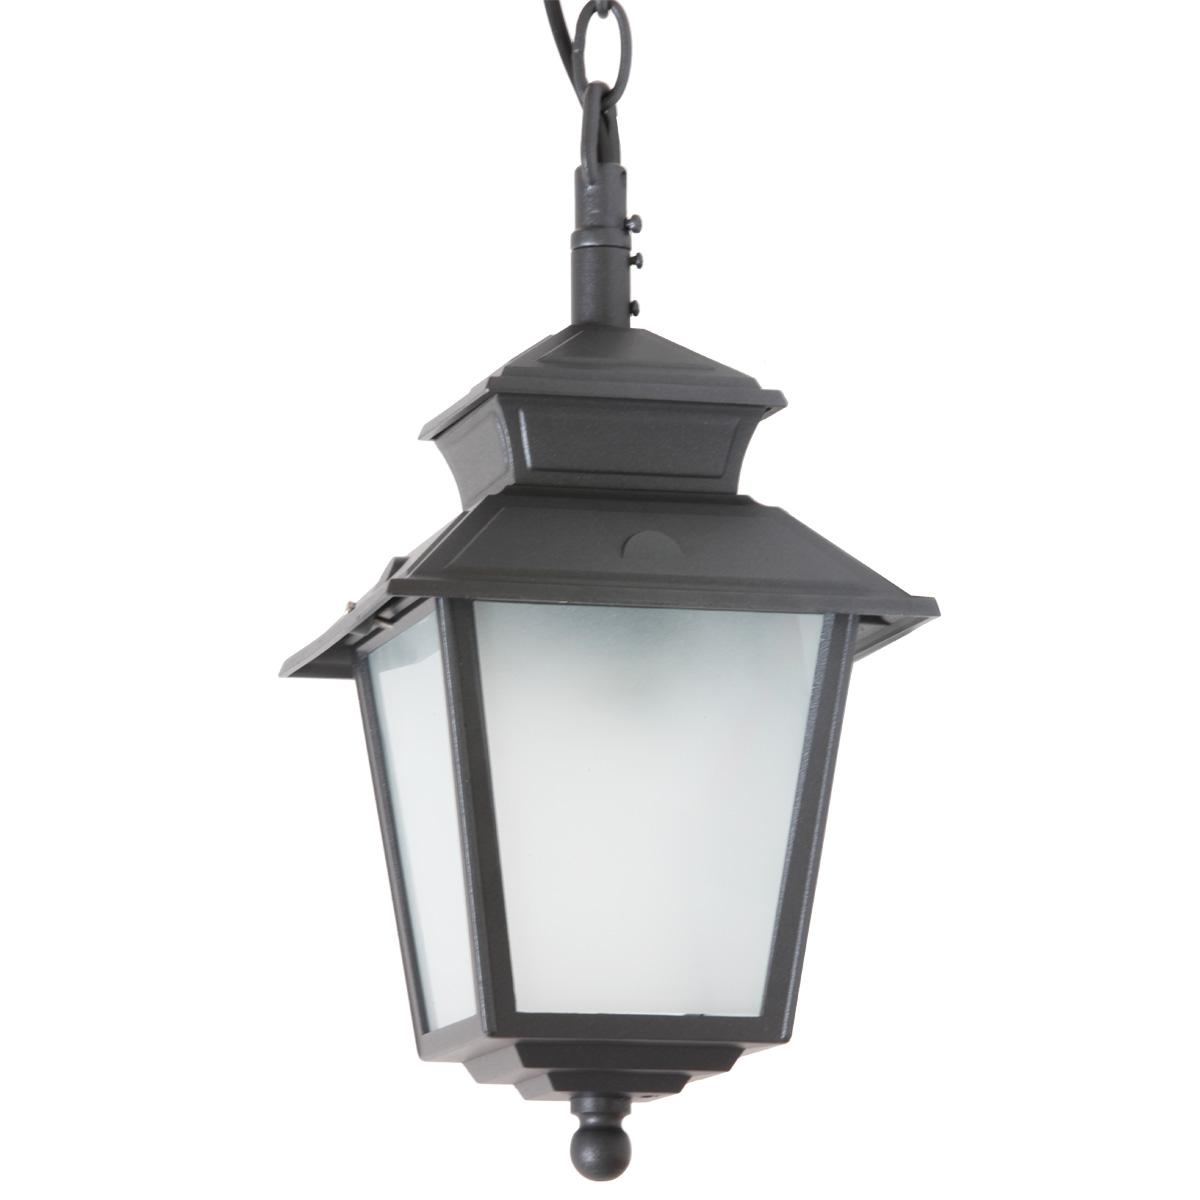 auenleuchte decke free led edelstahl aussenlampe wandleuchte lampe mit ir with auenleuchte. Black Bedroom Furniture Sets. Home Design Ideas